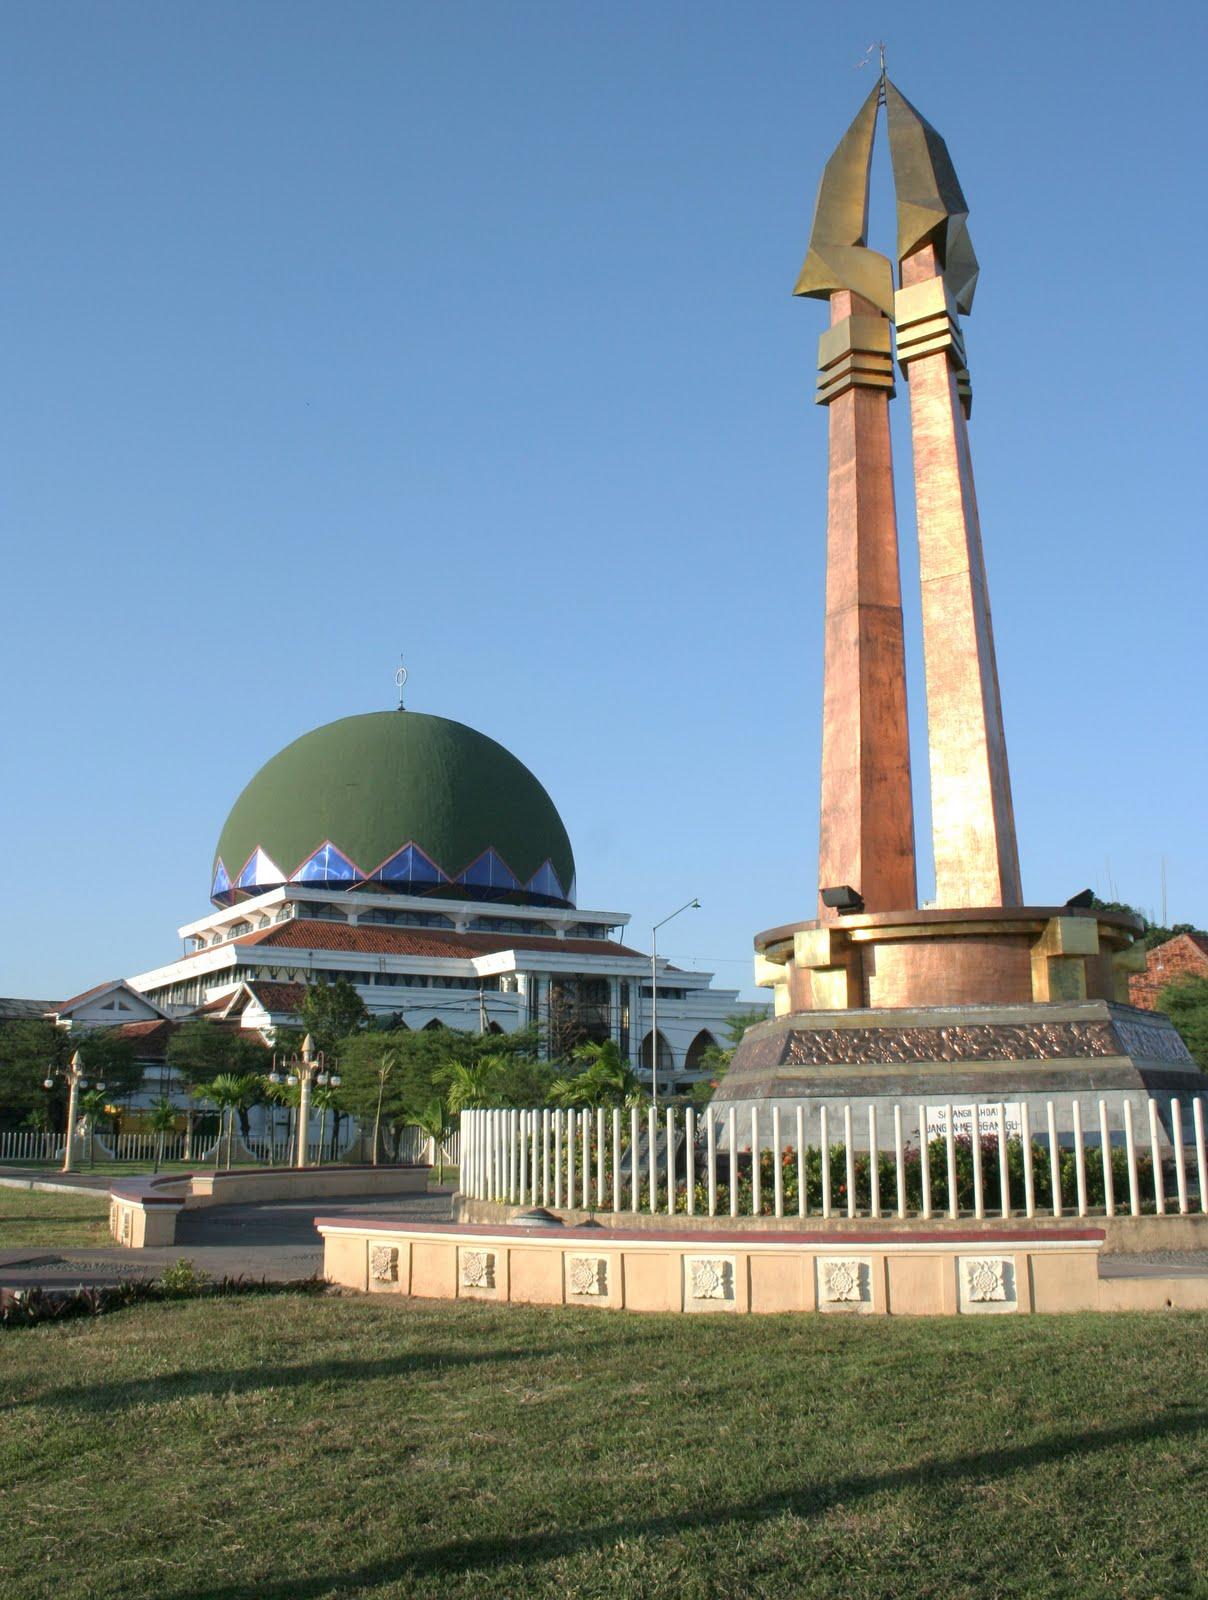 Kotaku Sampang Madura Qory99 Copy Monumend Kita Ciri Khas Sumur